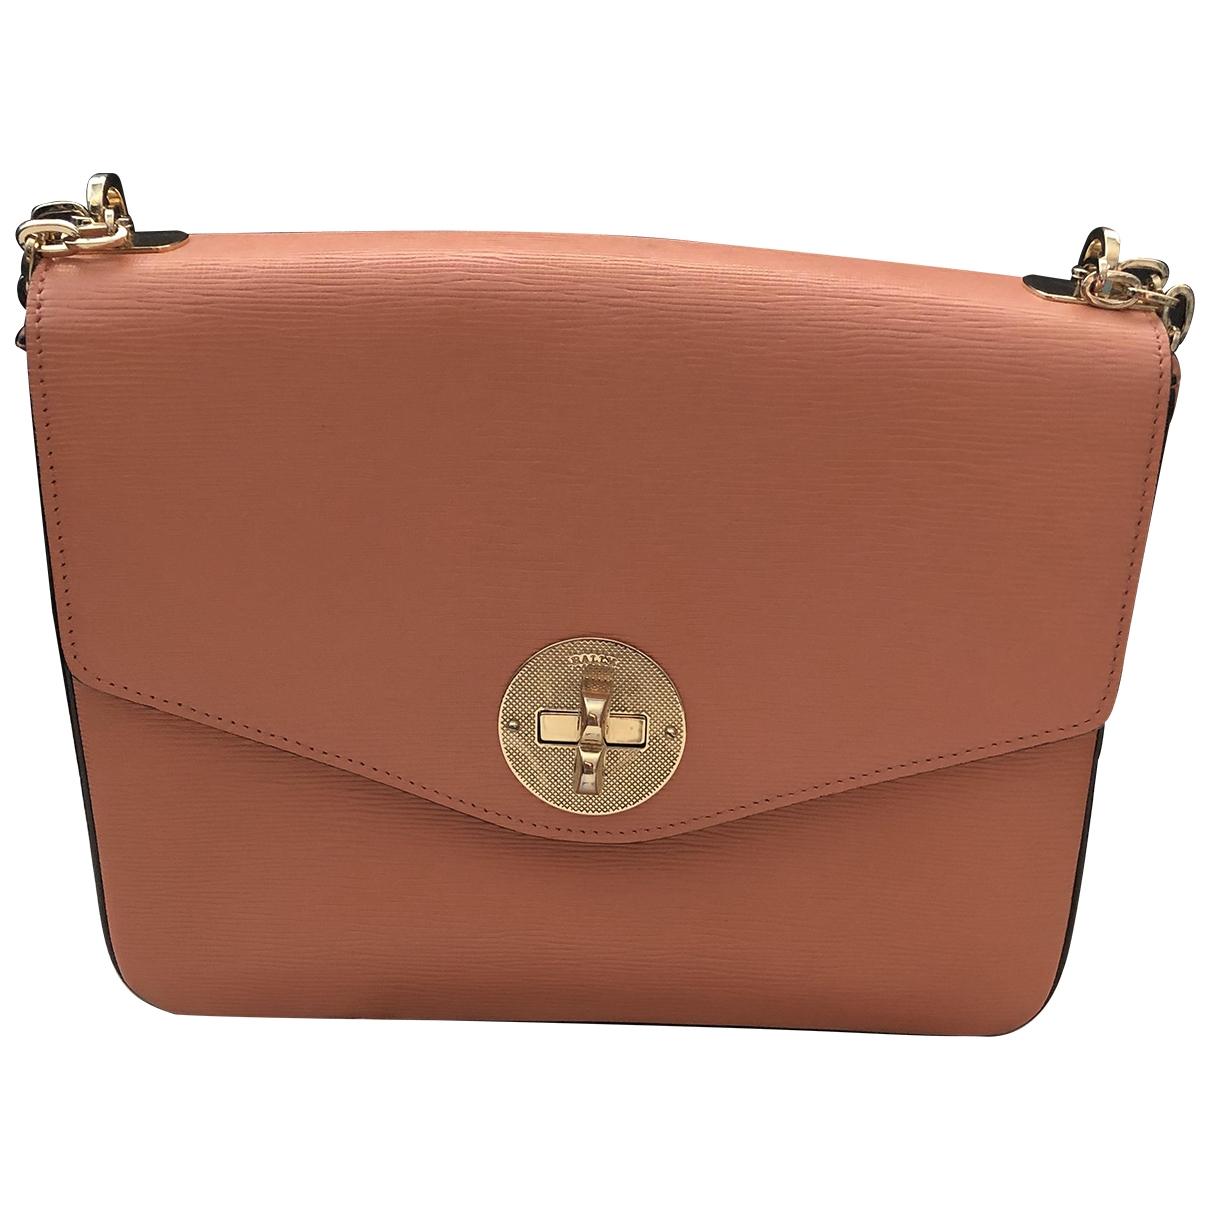 Bally \N Orange Leather handbag for Women \N